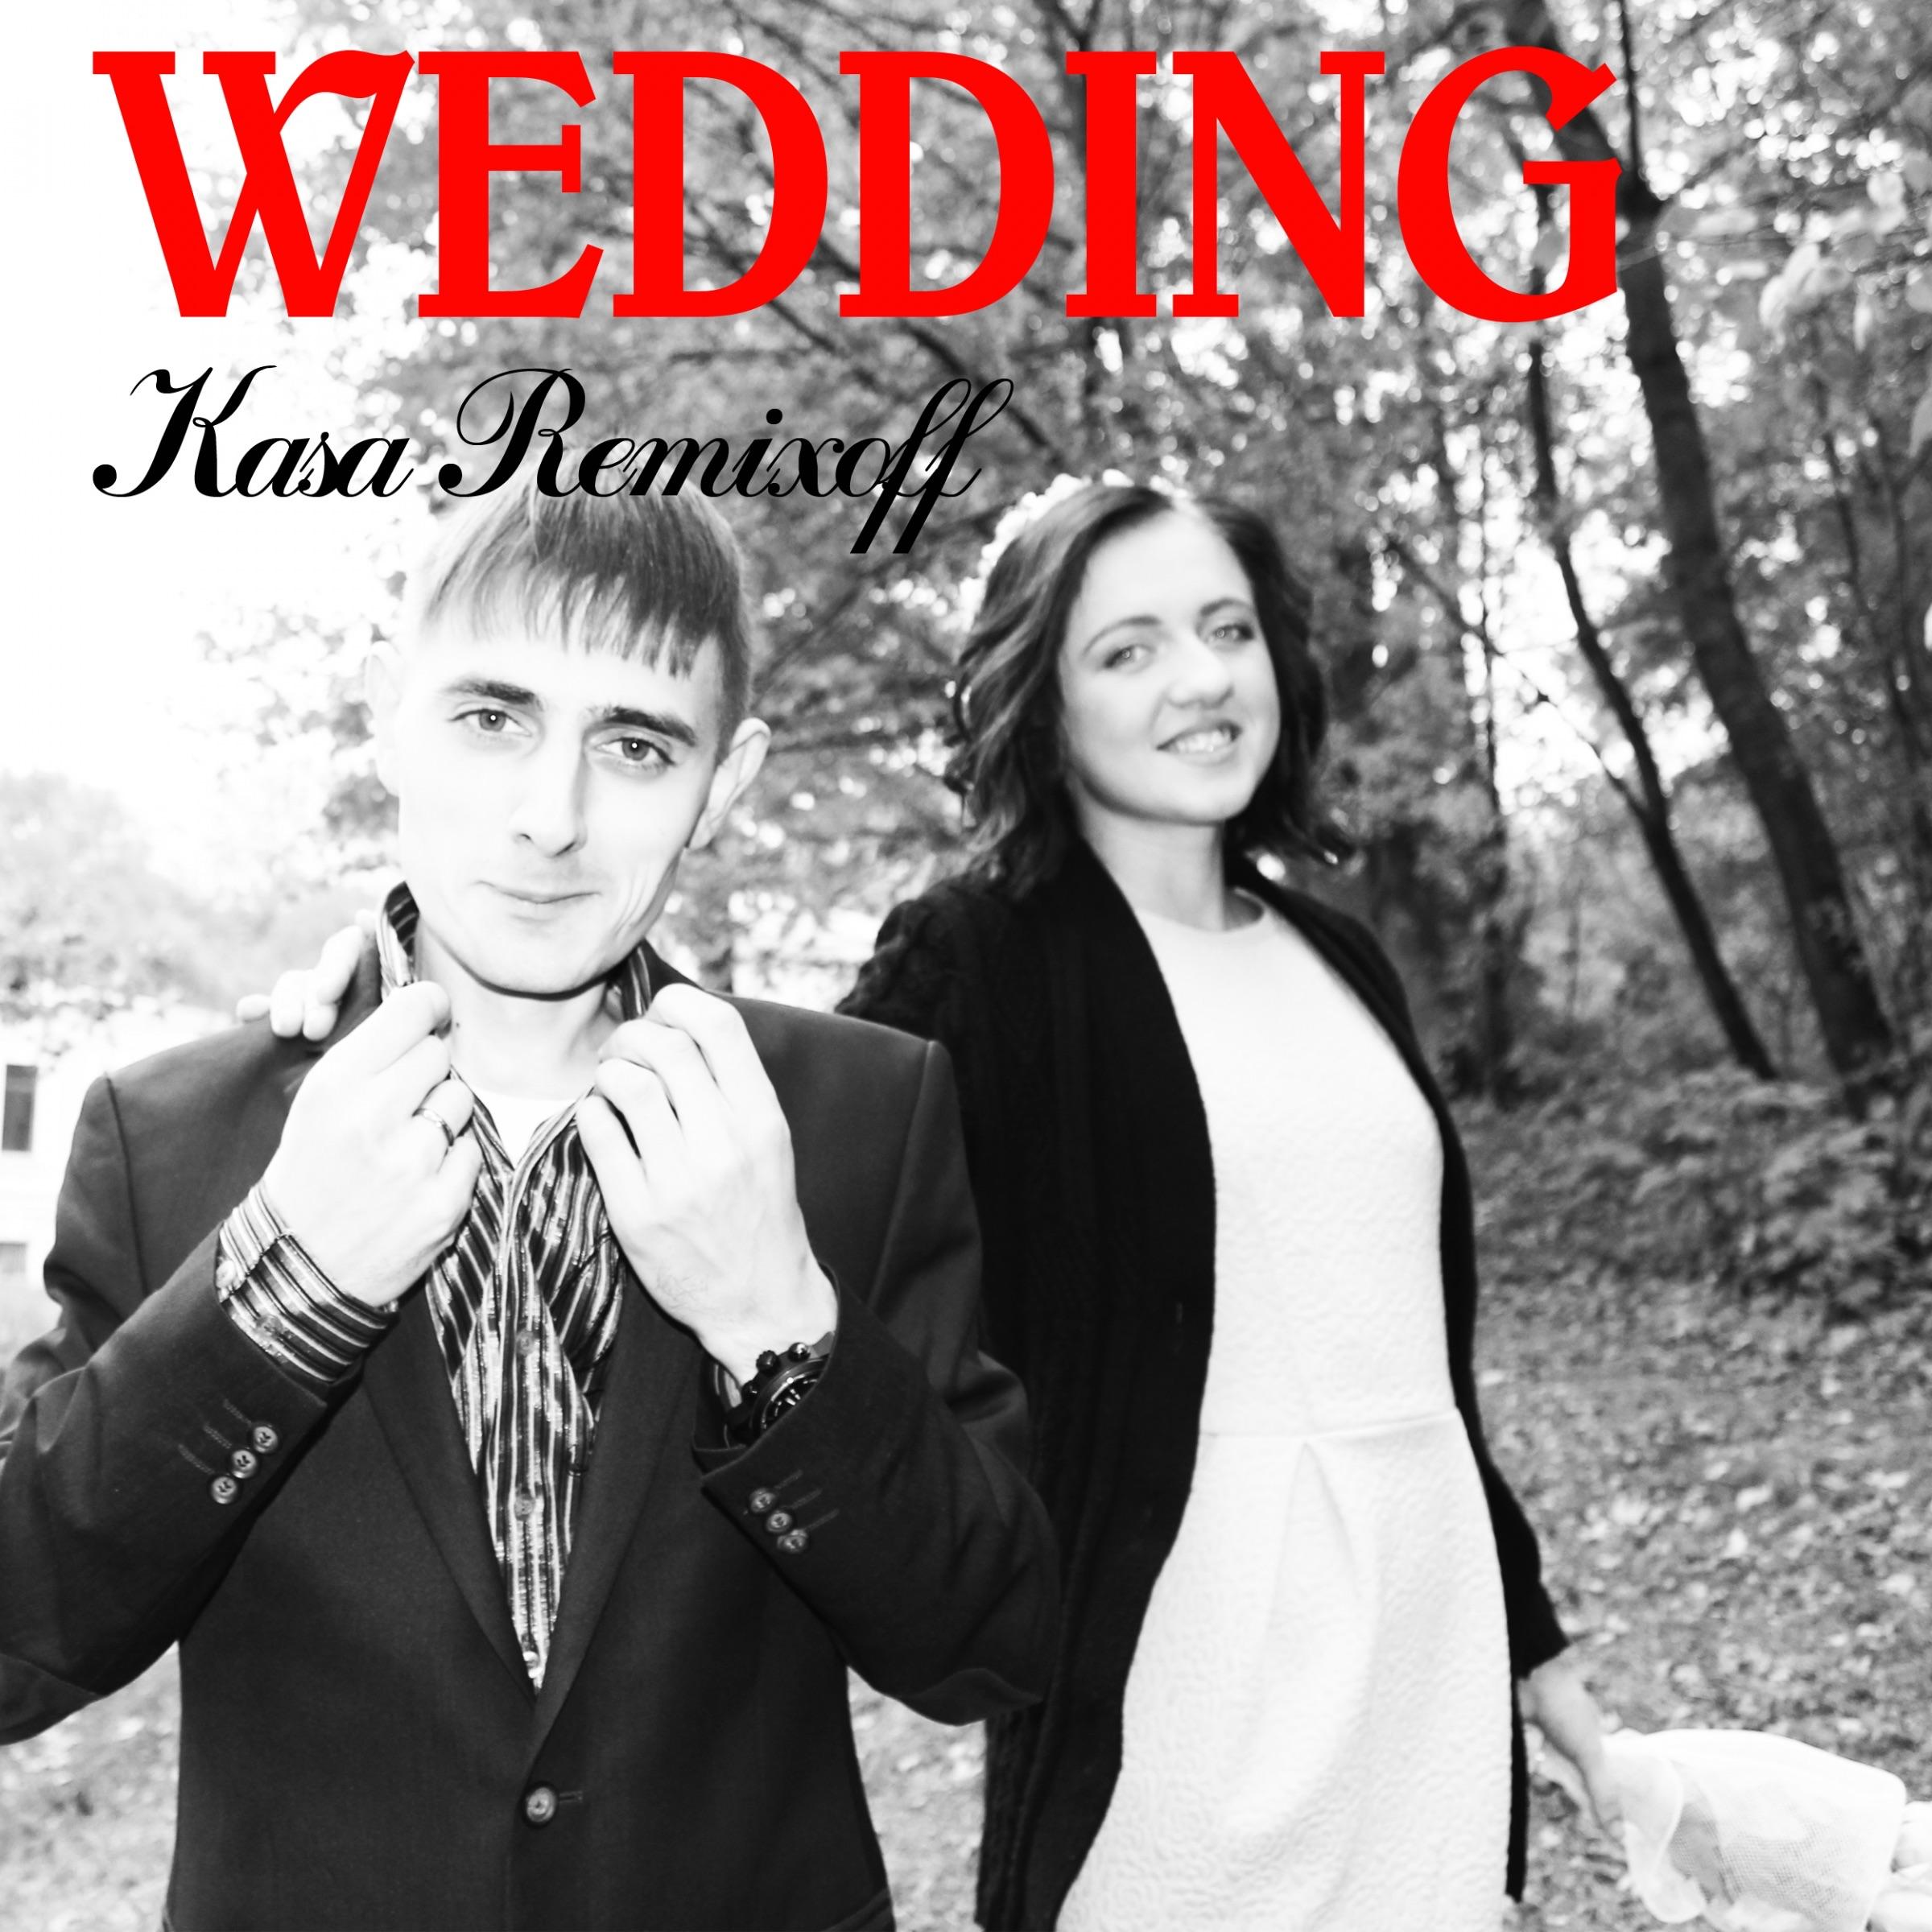 Wedding - Single